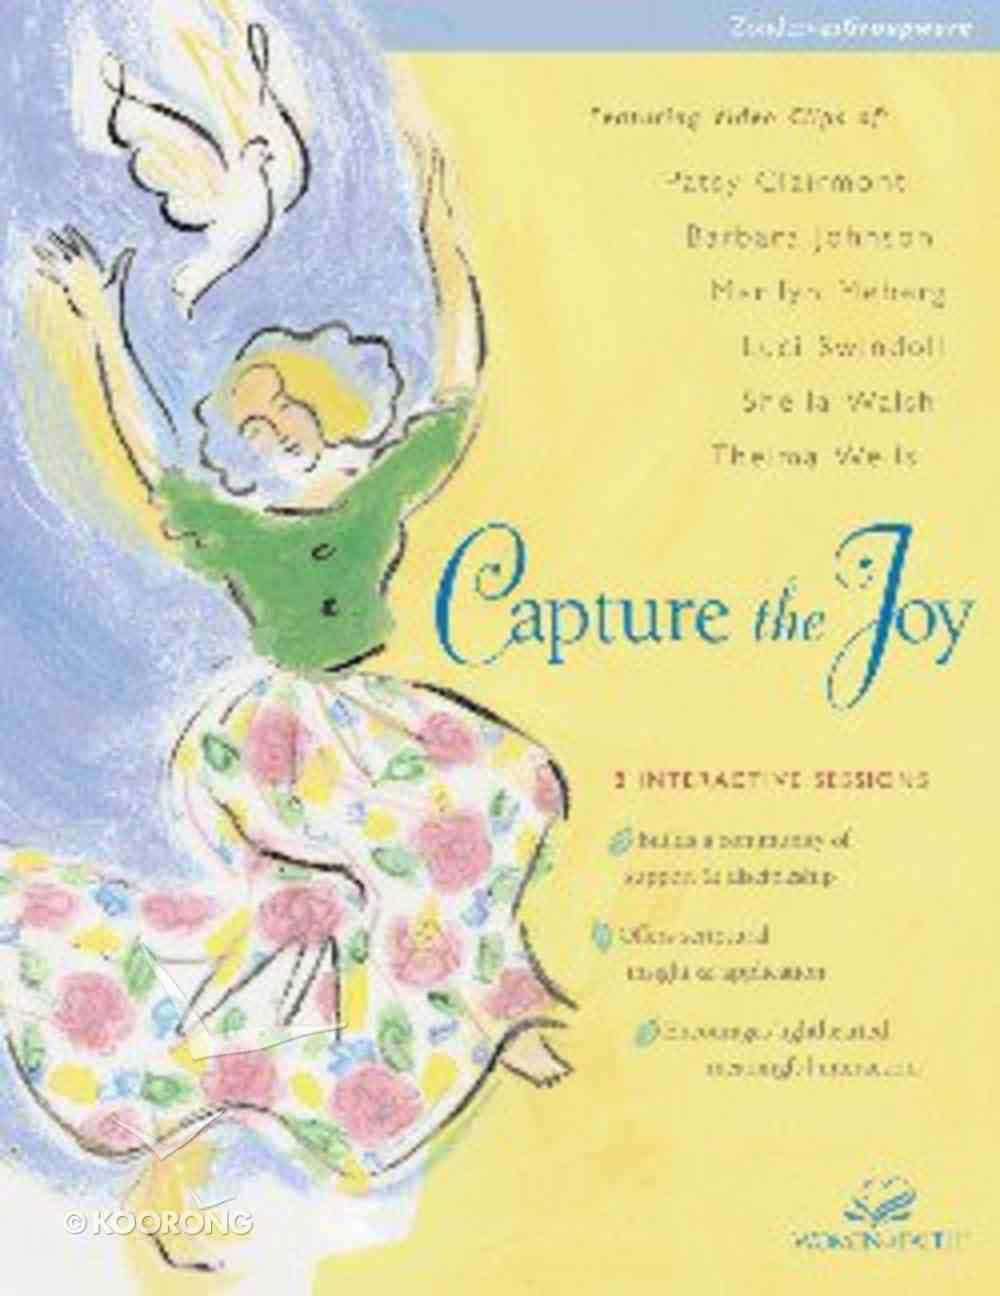 Video Capture the Joy Curriculum Kit Pack